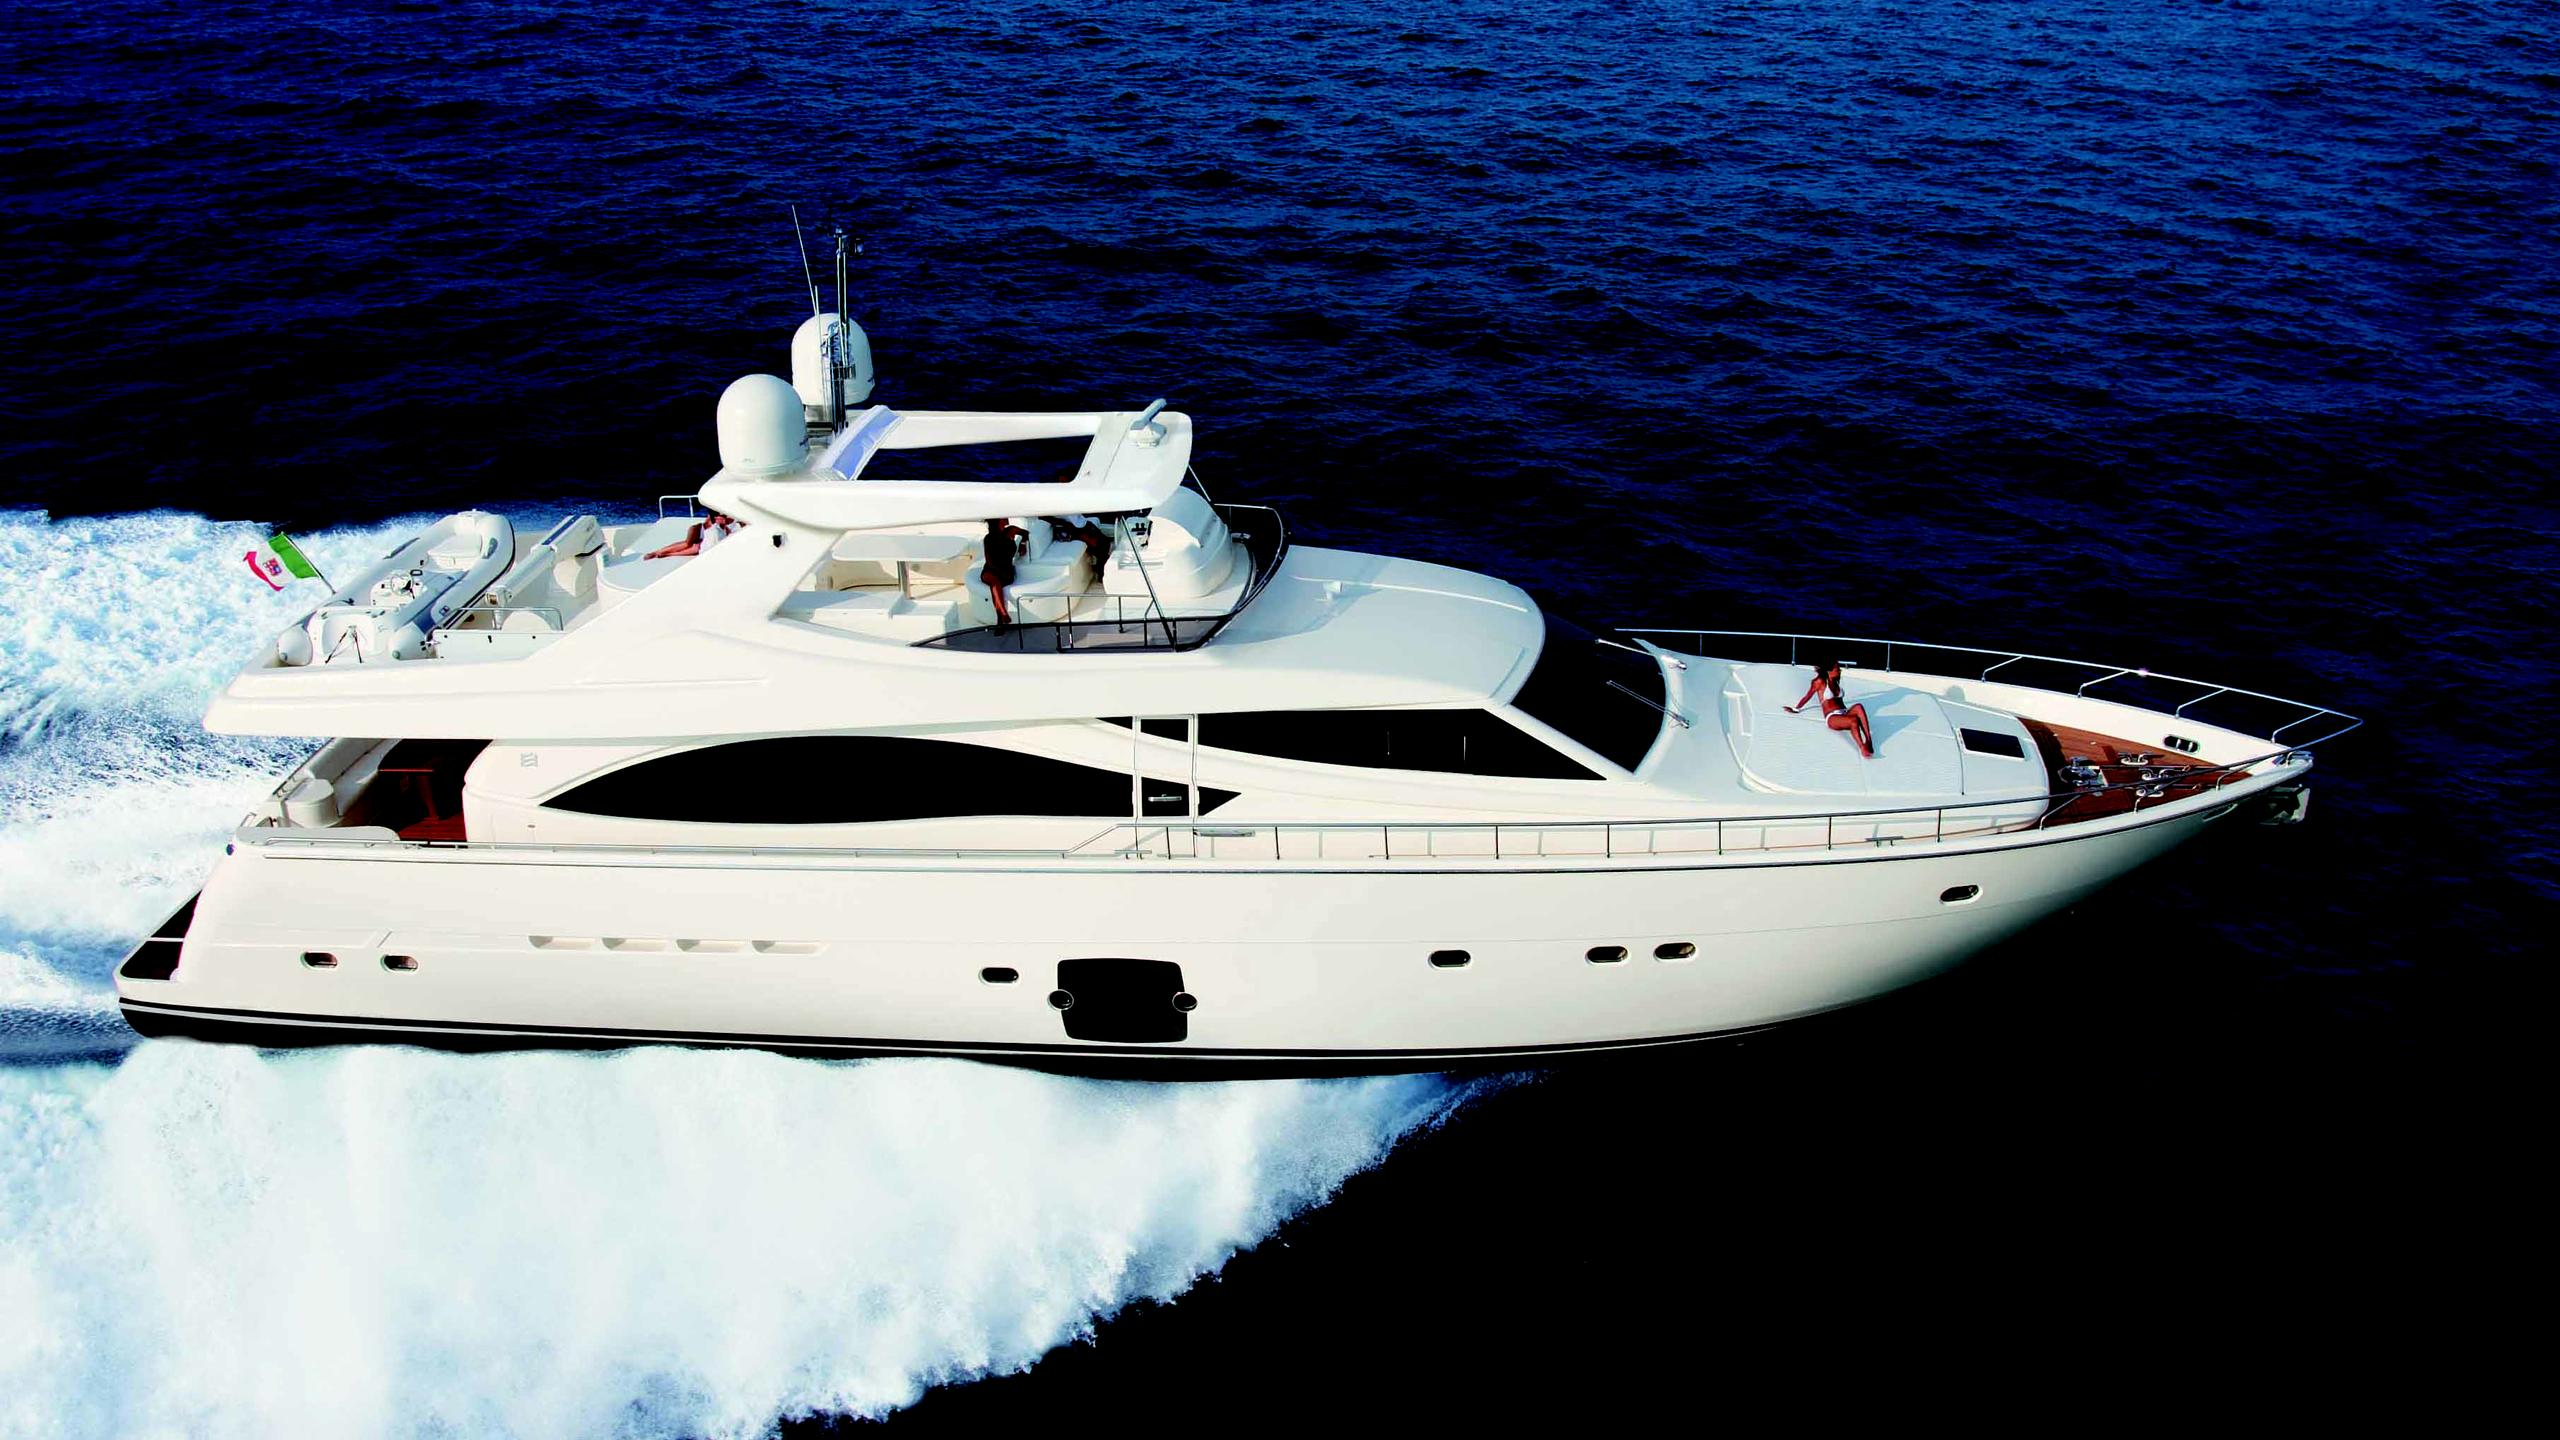 felixia-motor-yacht-ferretti-830-2006-25m-cruising